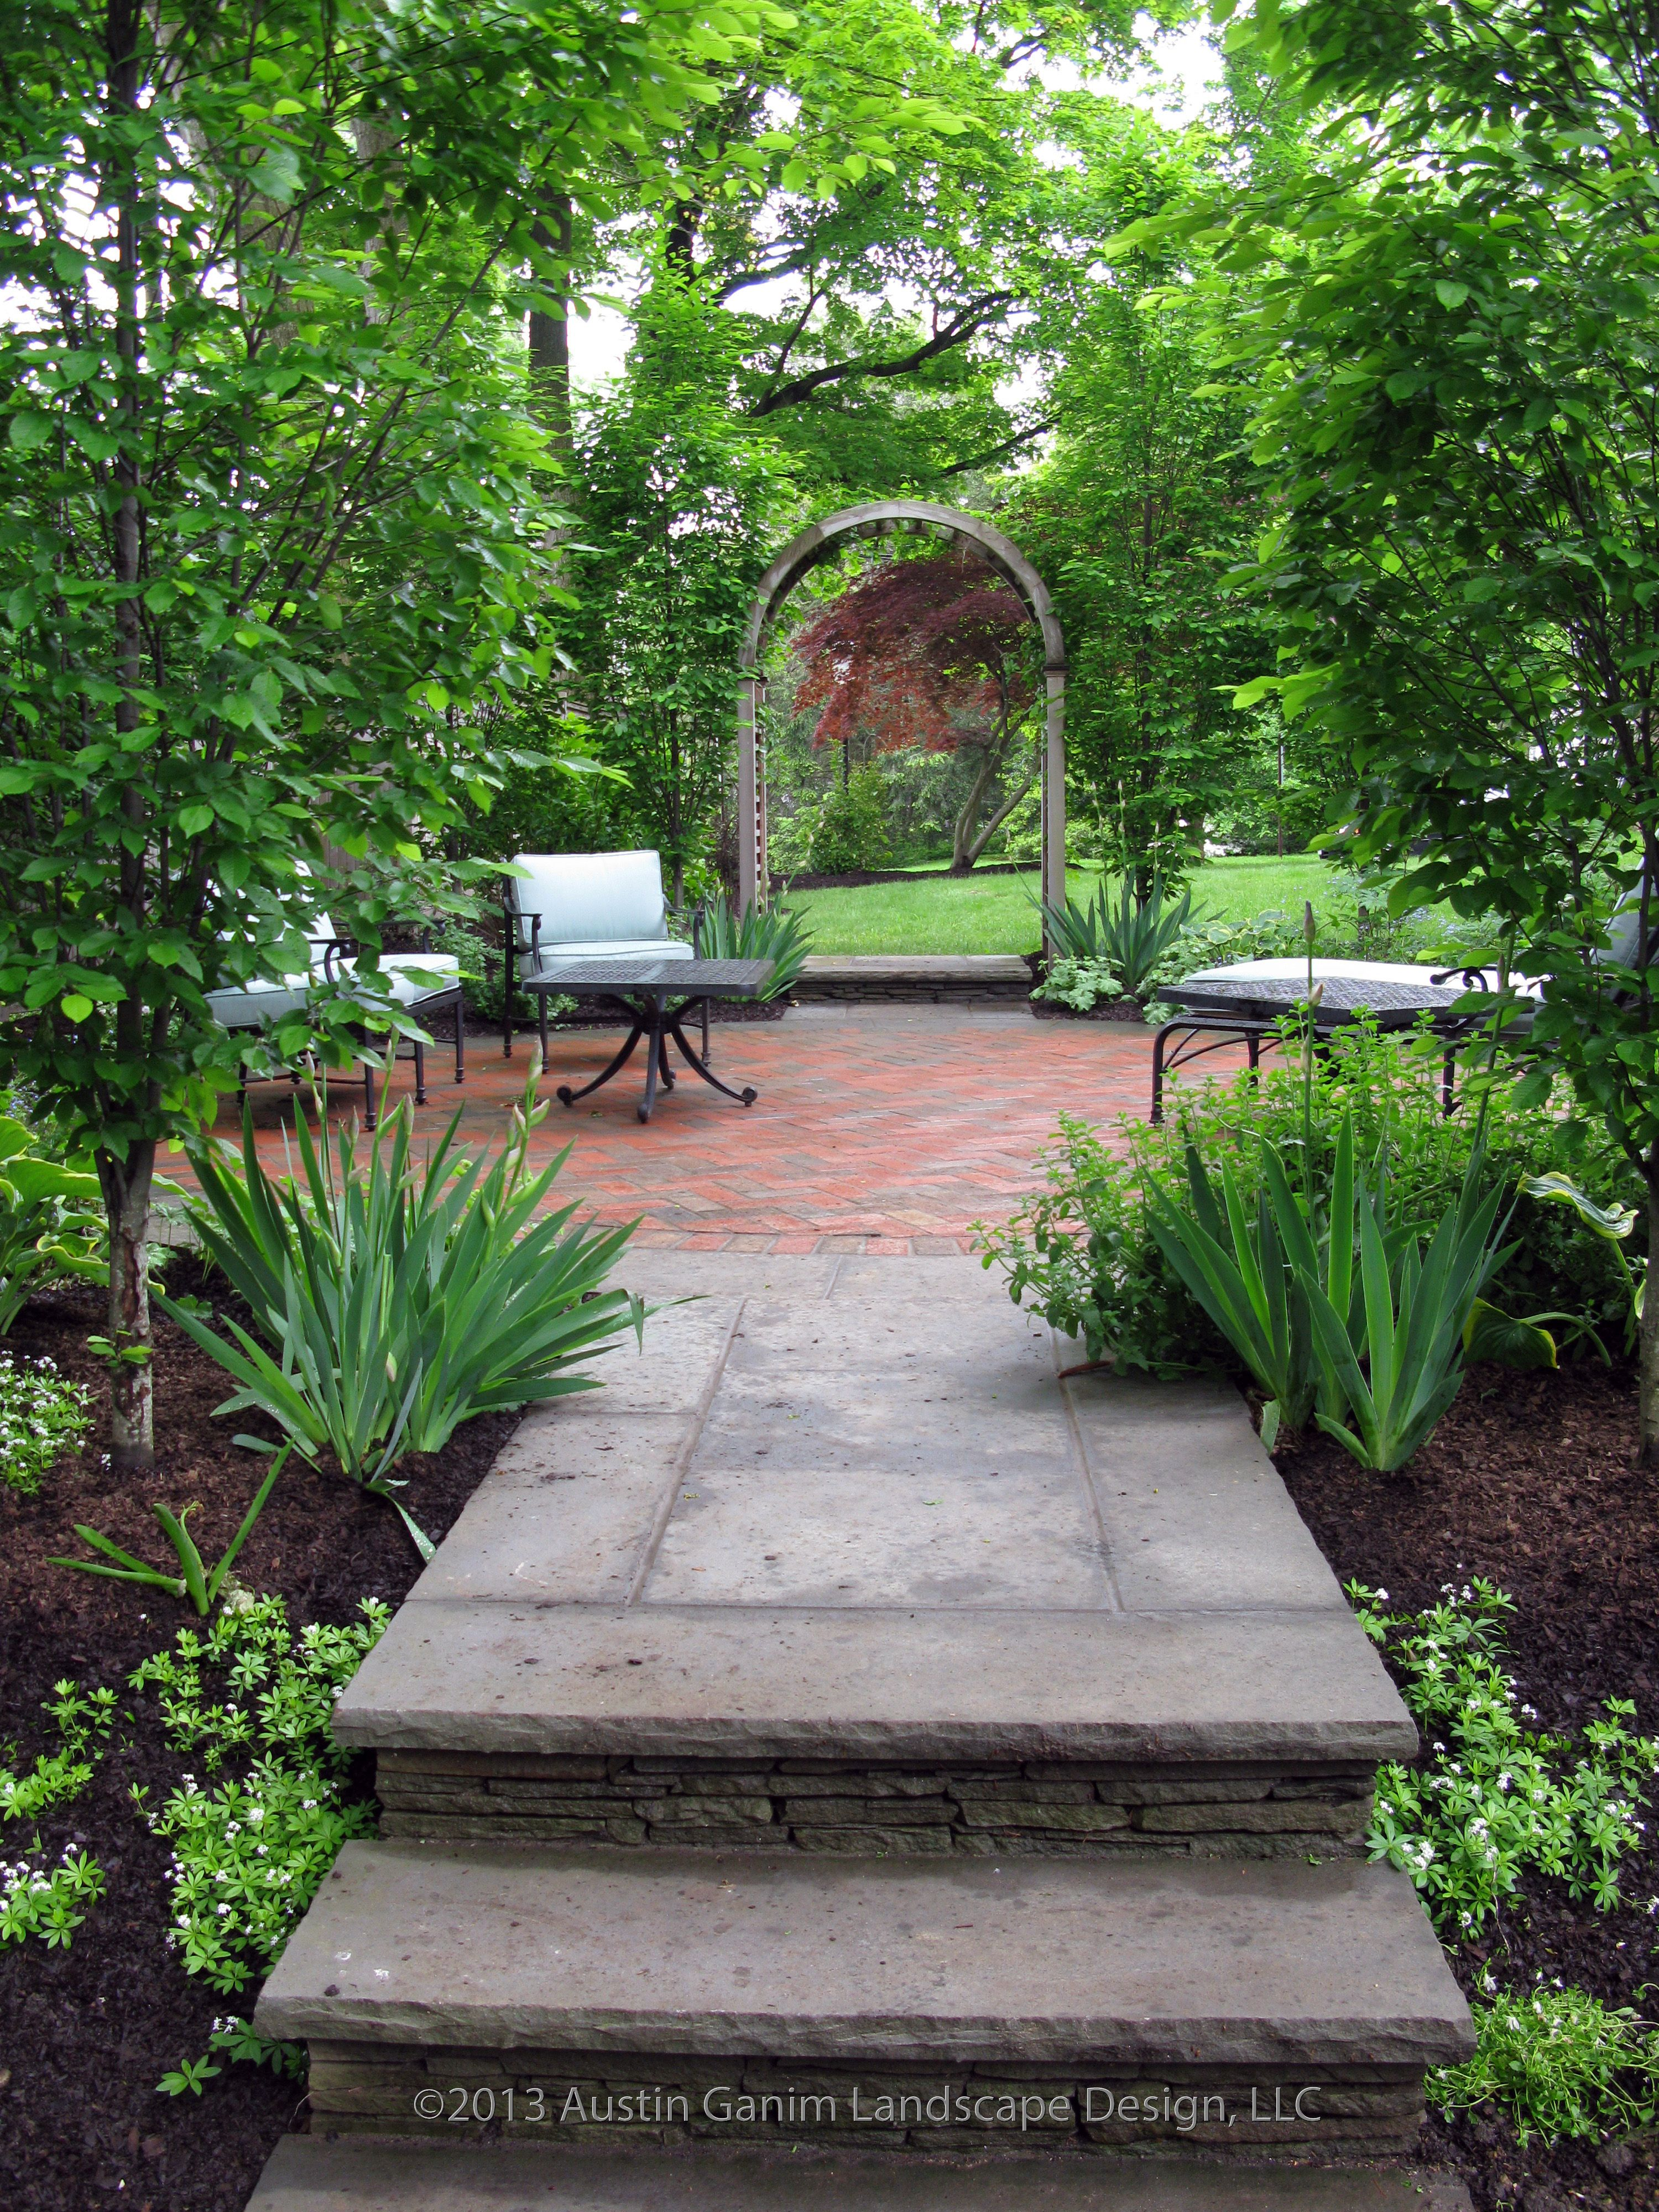 European Hornbeam Frame The Circular Brick And Bluestone Patio Of The Shade Garden Southport Ct Shade Garden Serenity Garden Dream Garden